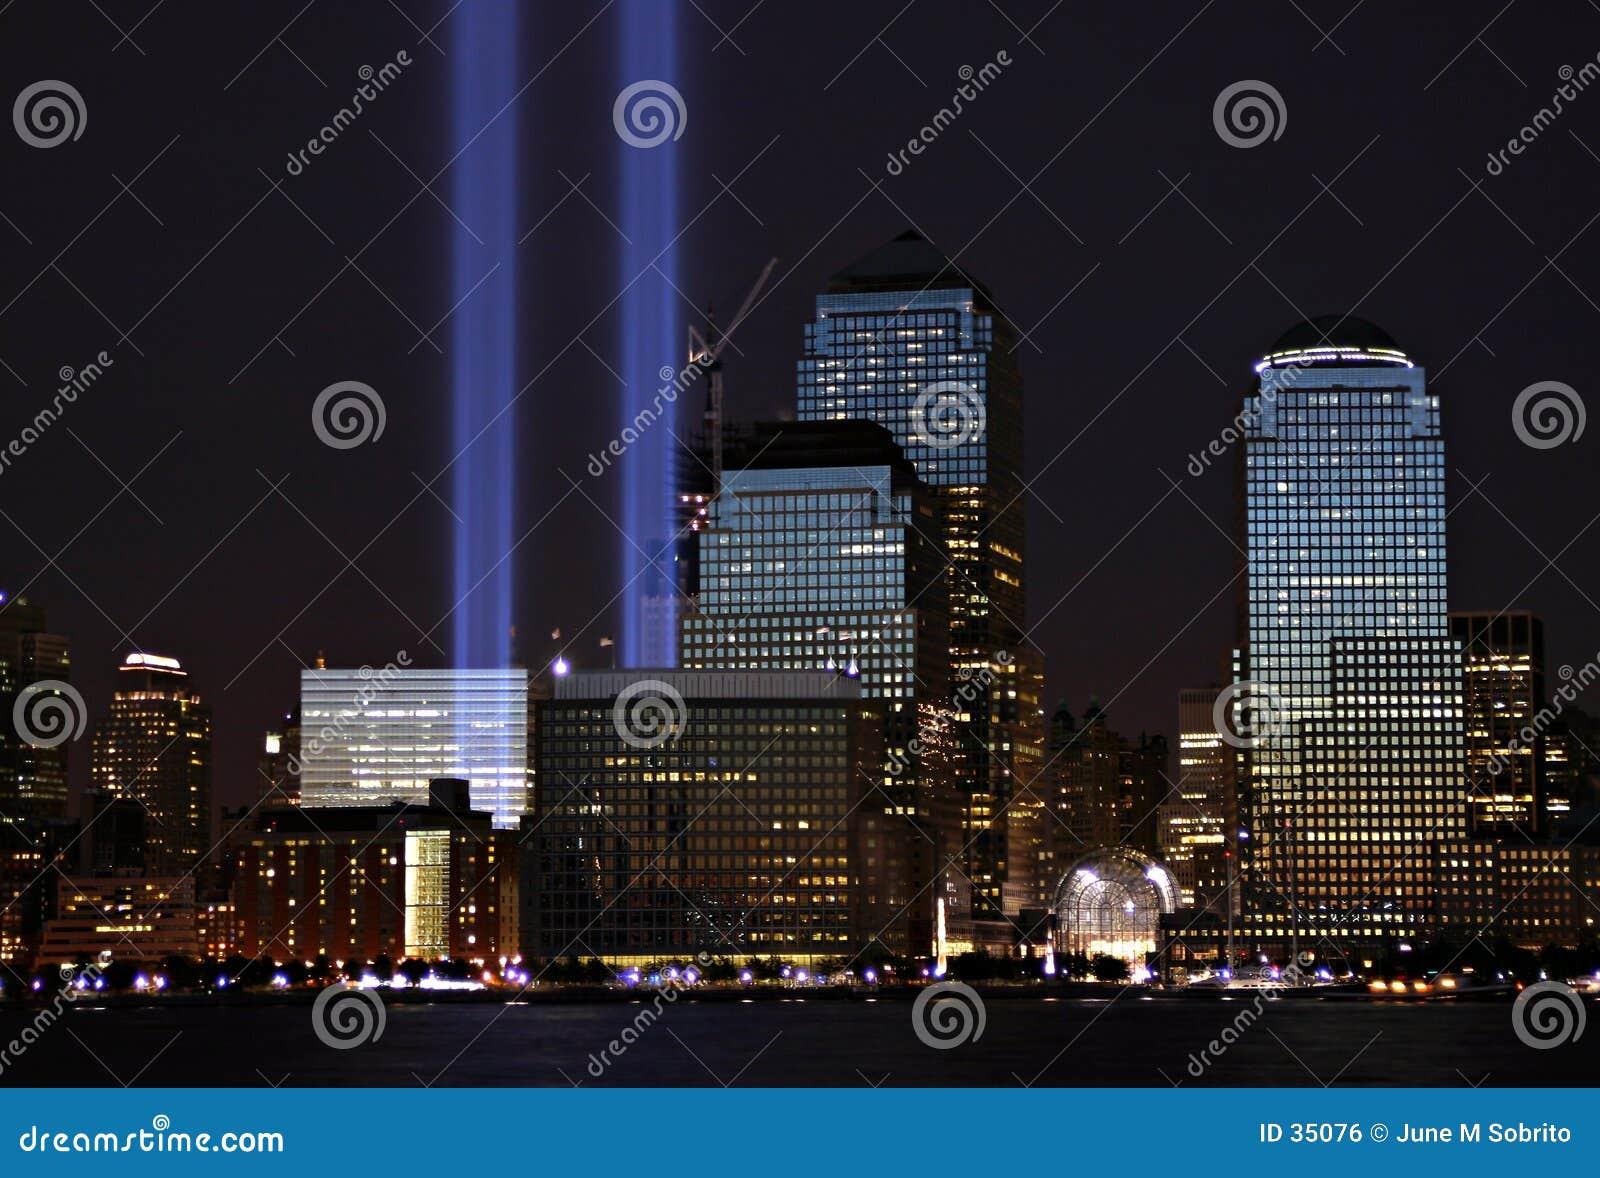 Lights tribute